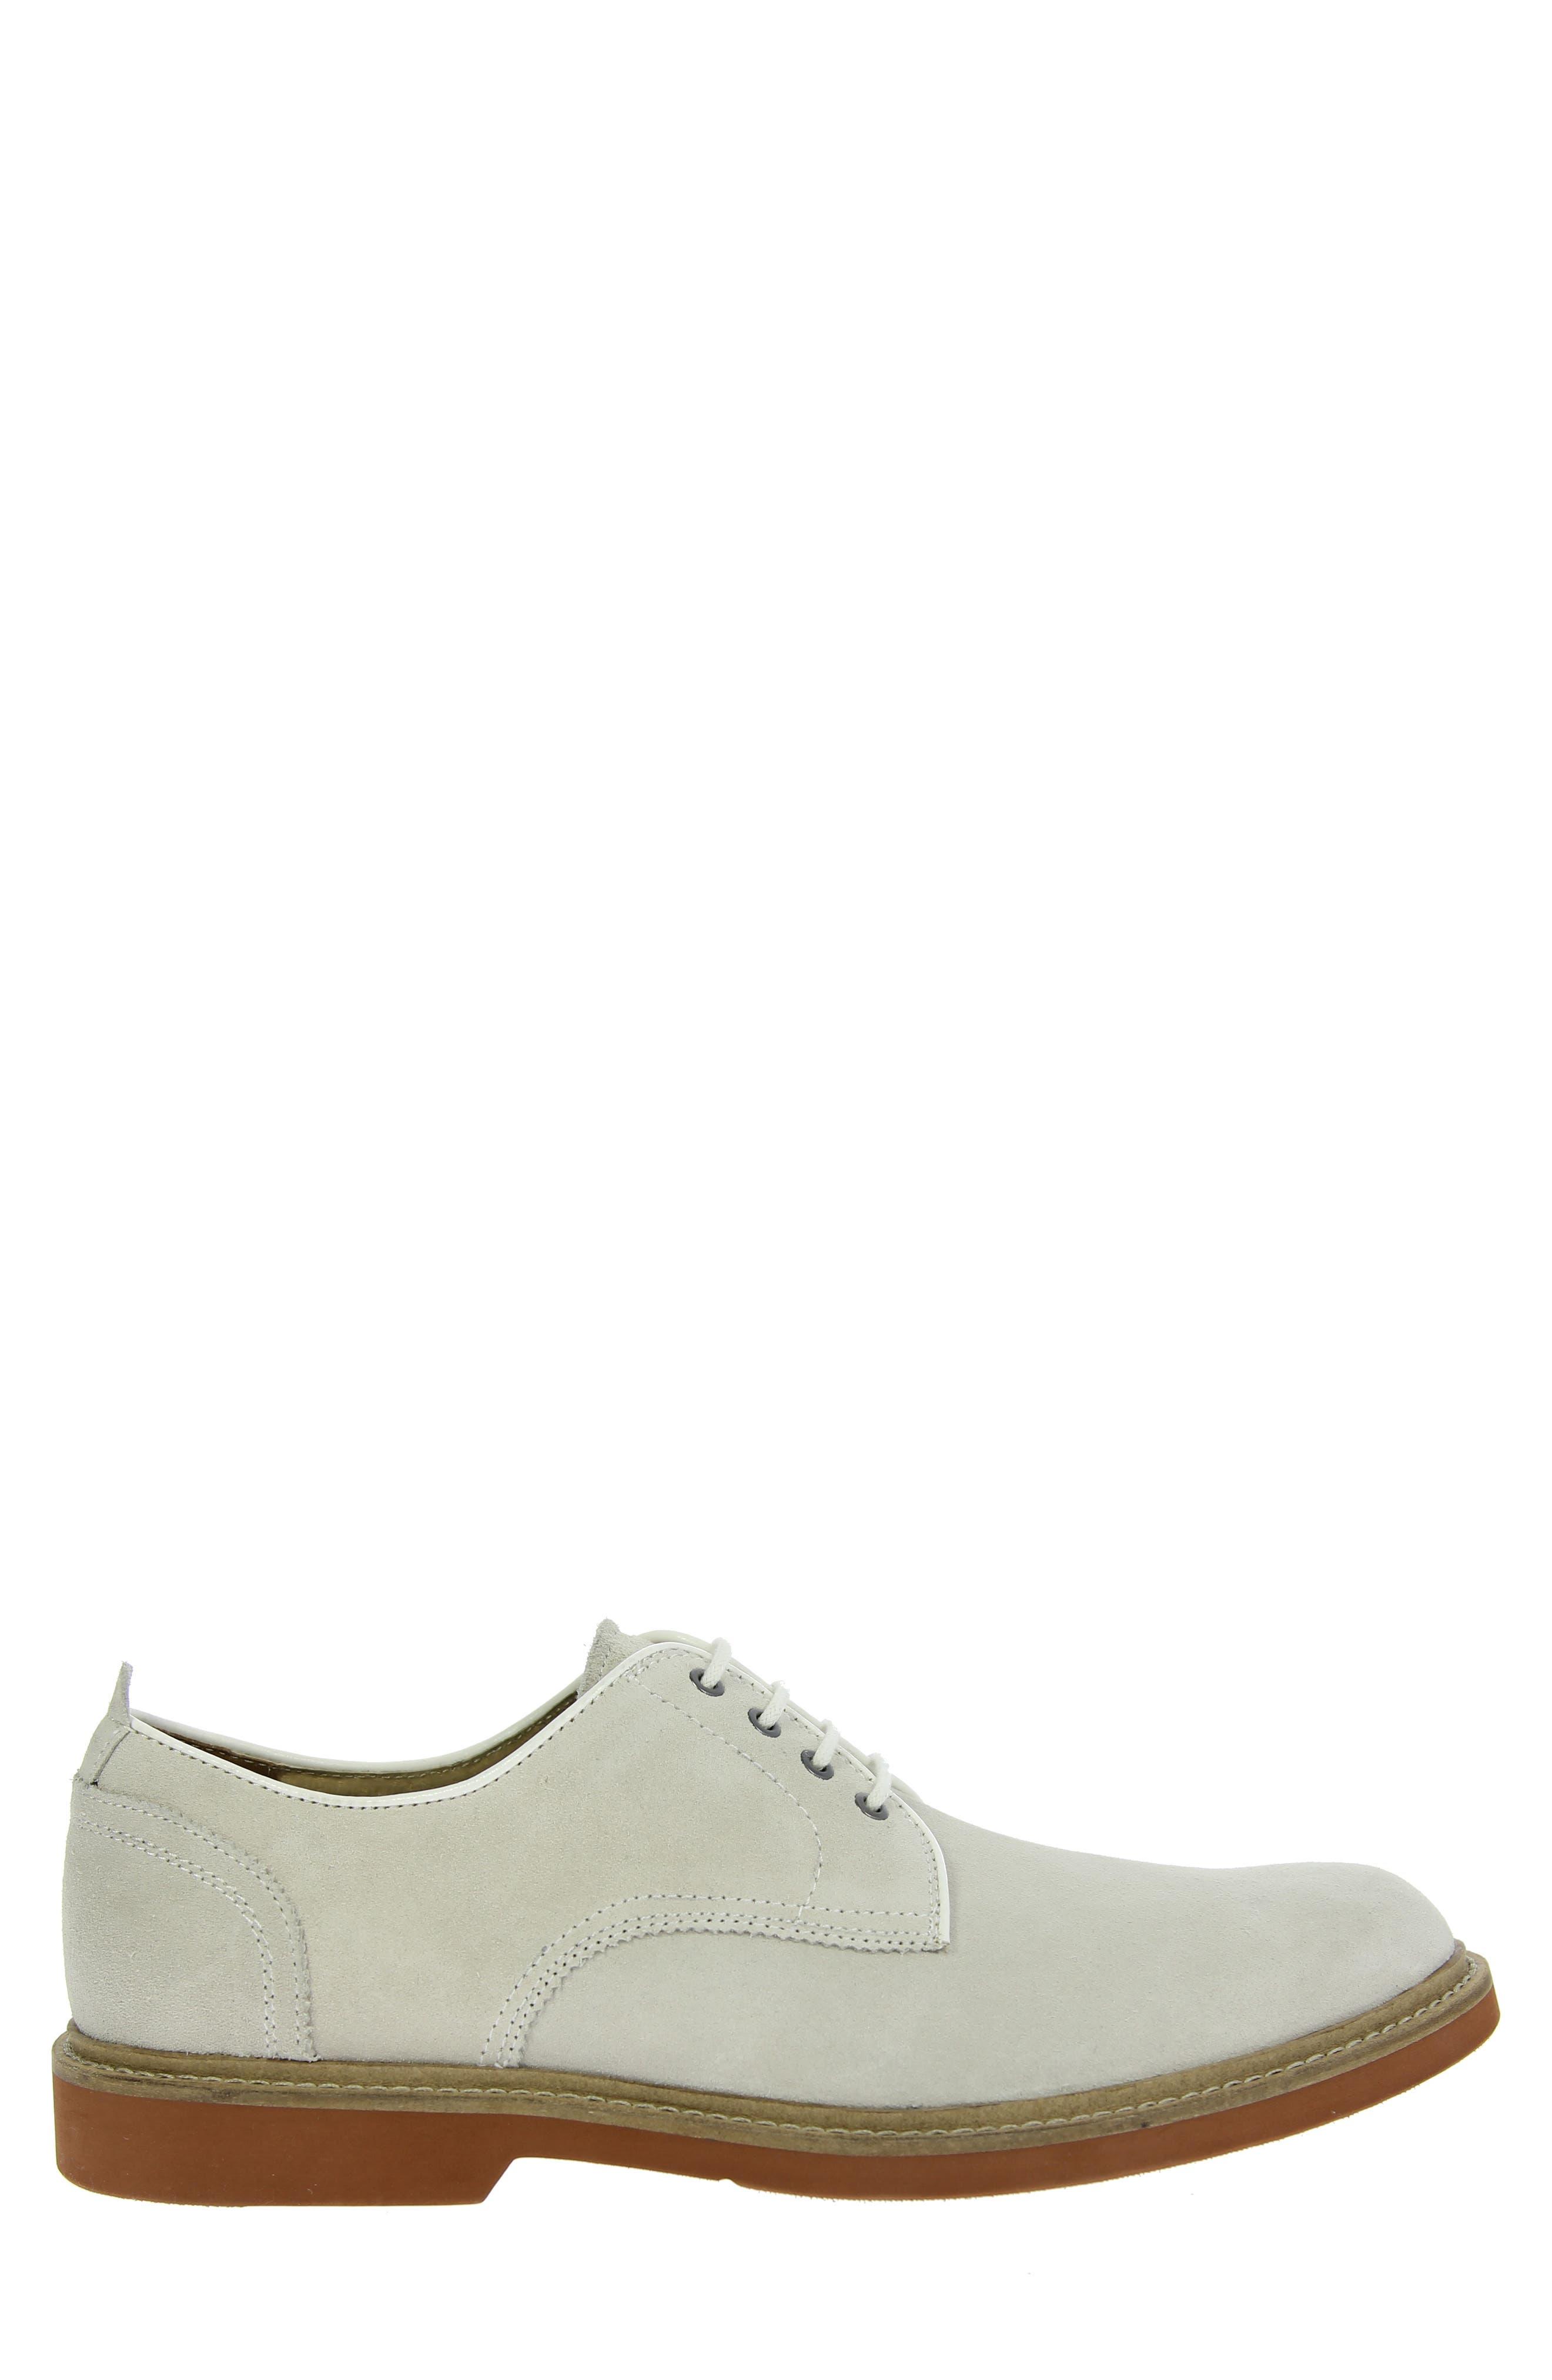 'Bucktown' Buck Shoe,                             Alternate thumbnail 6, color,                             WHITE SUEDE